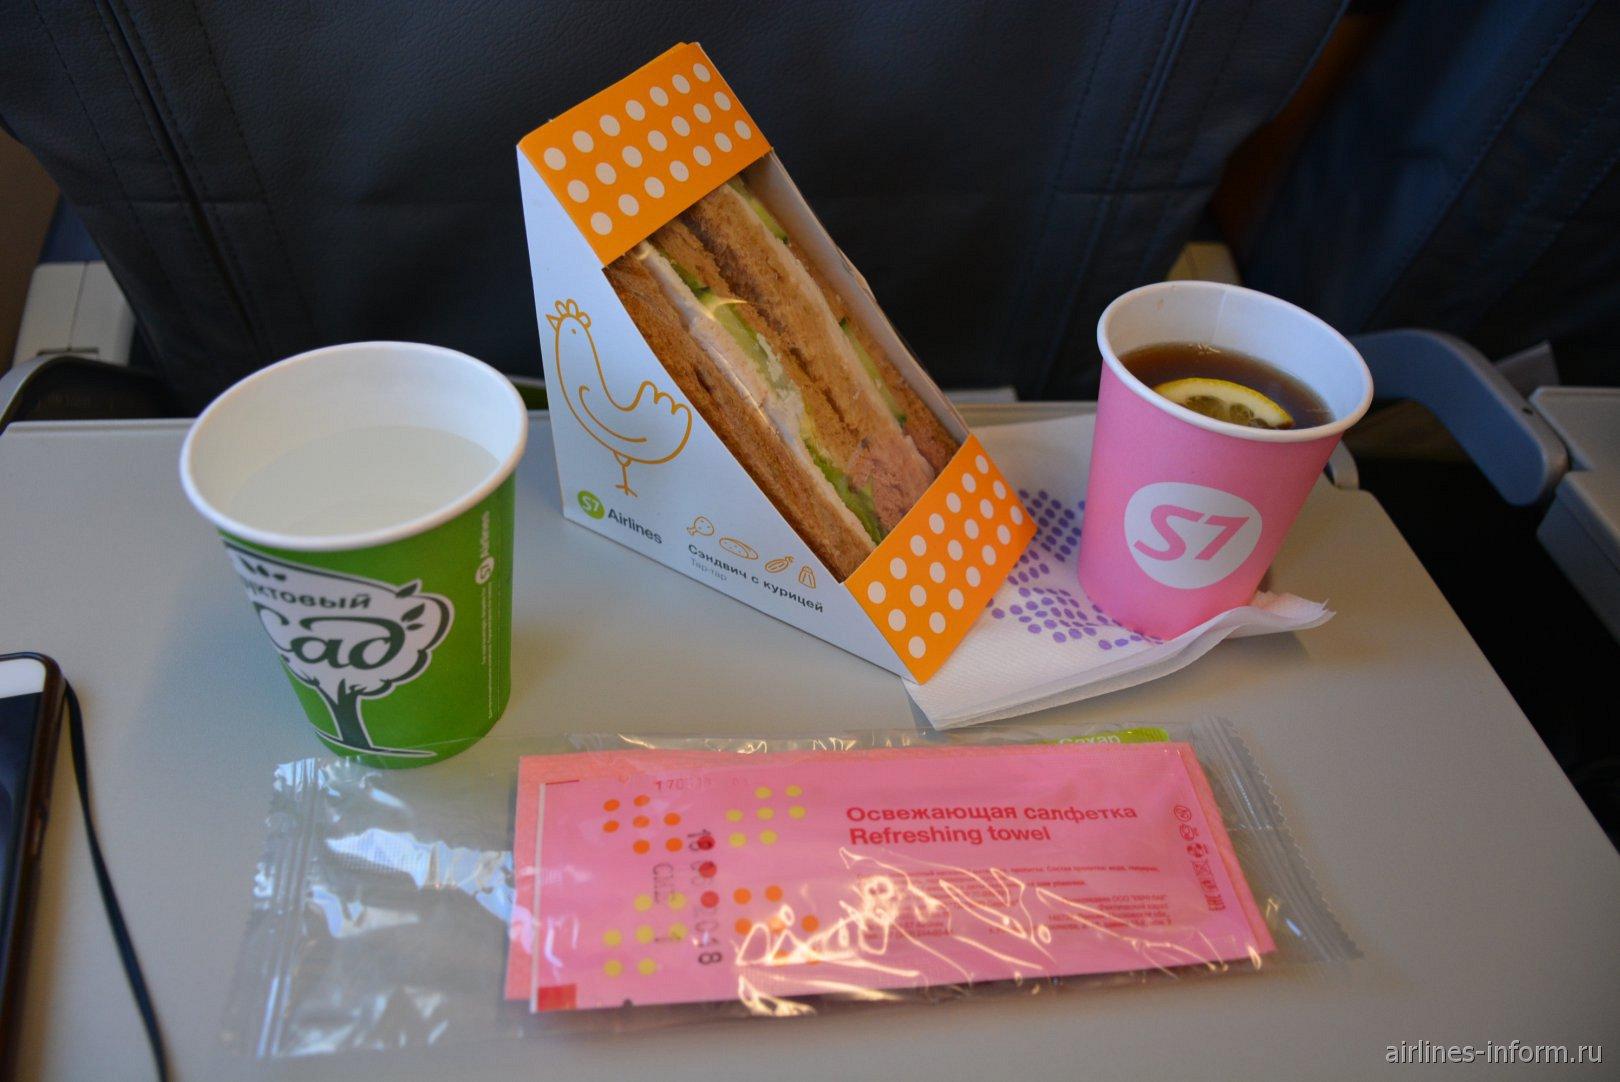 Сэндвич на рейсе Санкт-Петербург-Москва авиакомпании S7 Airlines